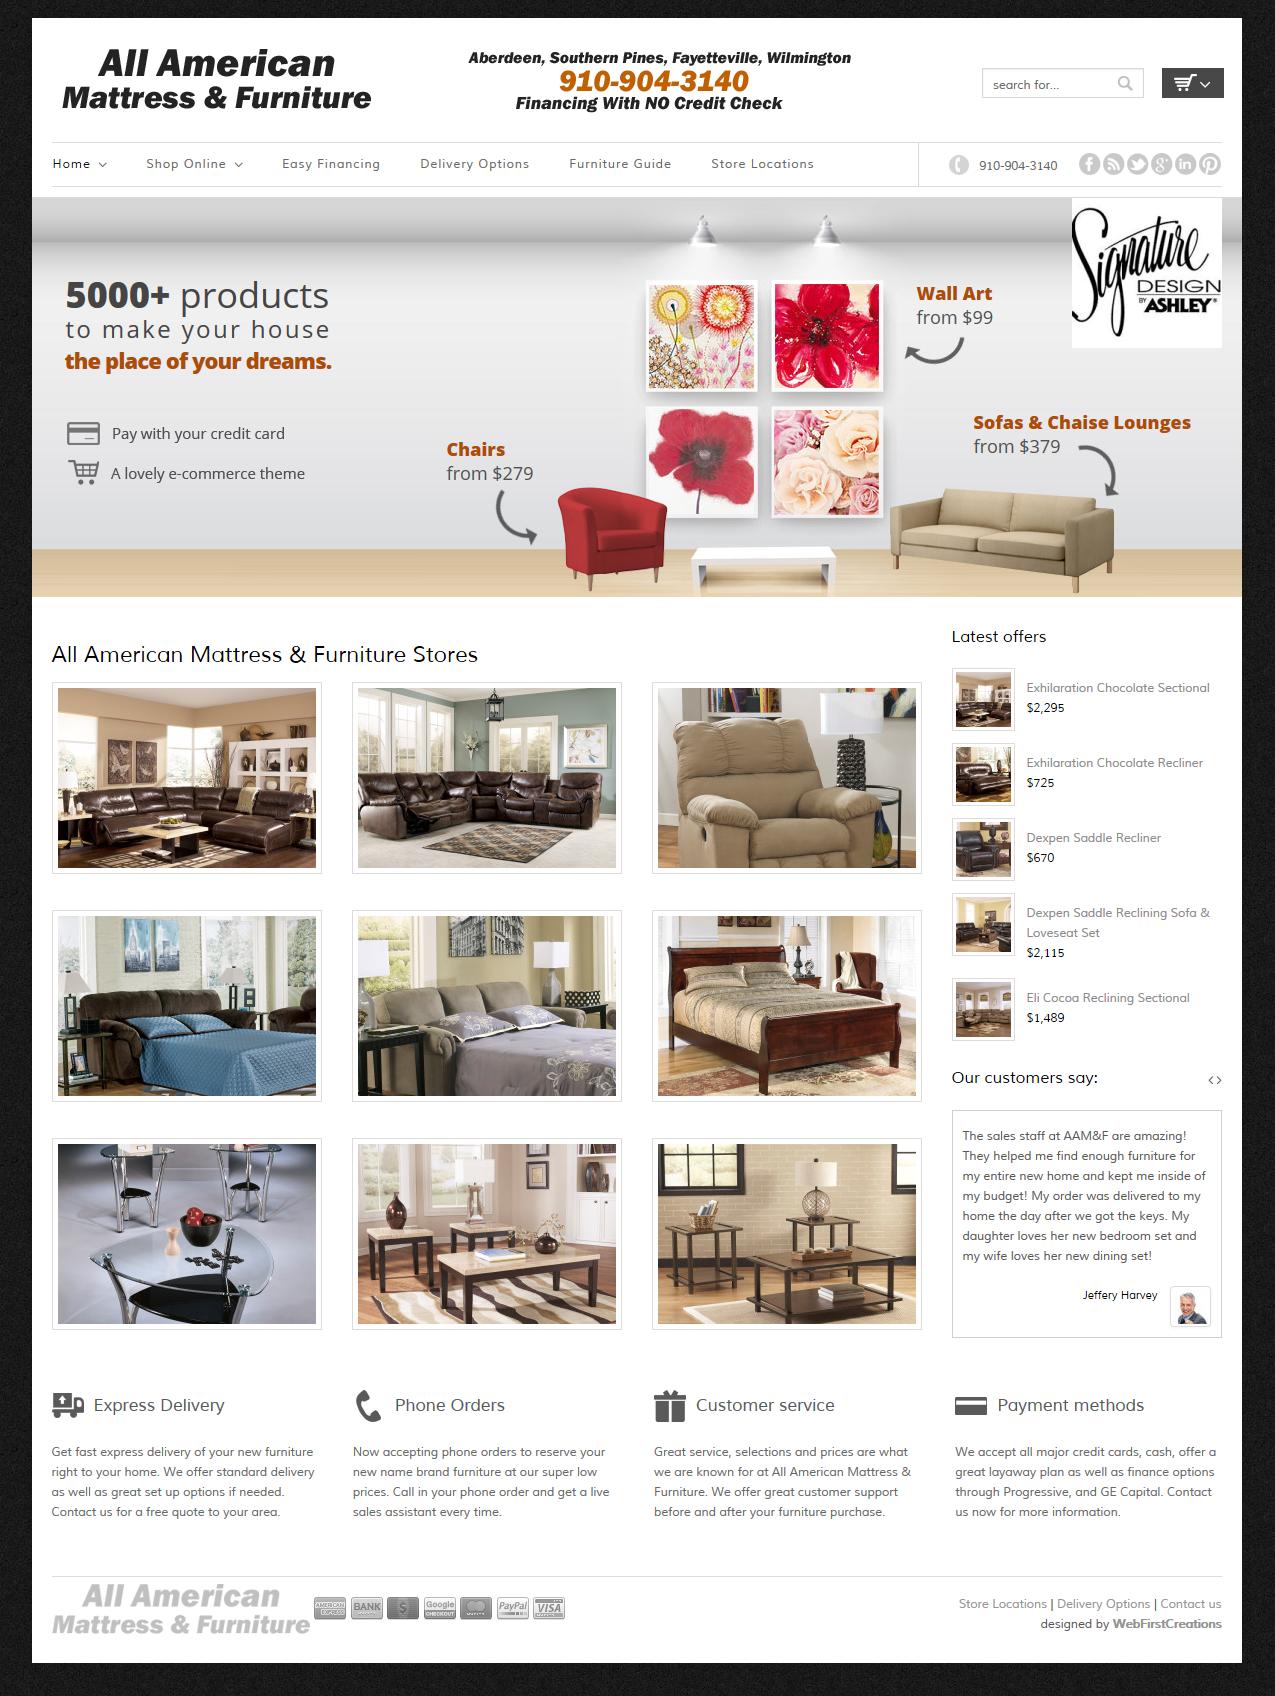 New Shopping Cart Site For All American Mattress U0026 Furniture Of Aberdeen NC